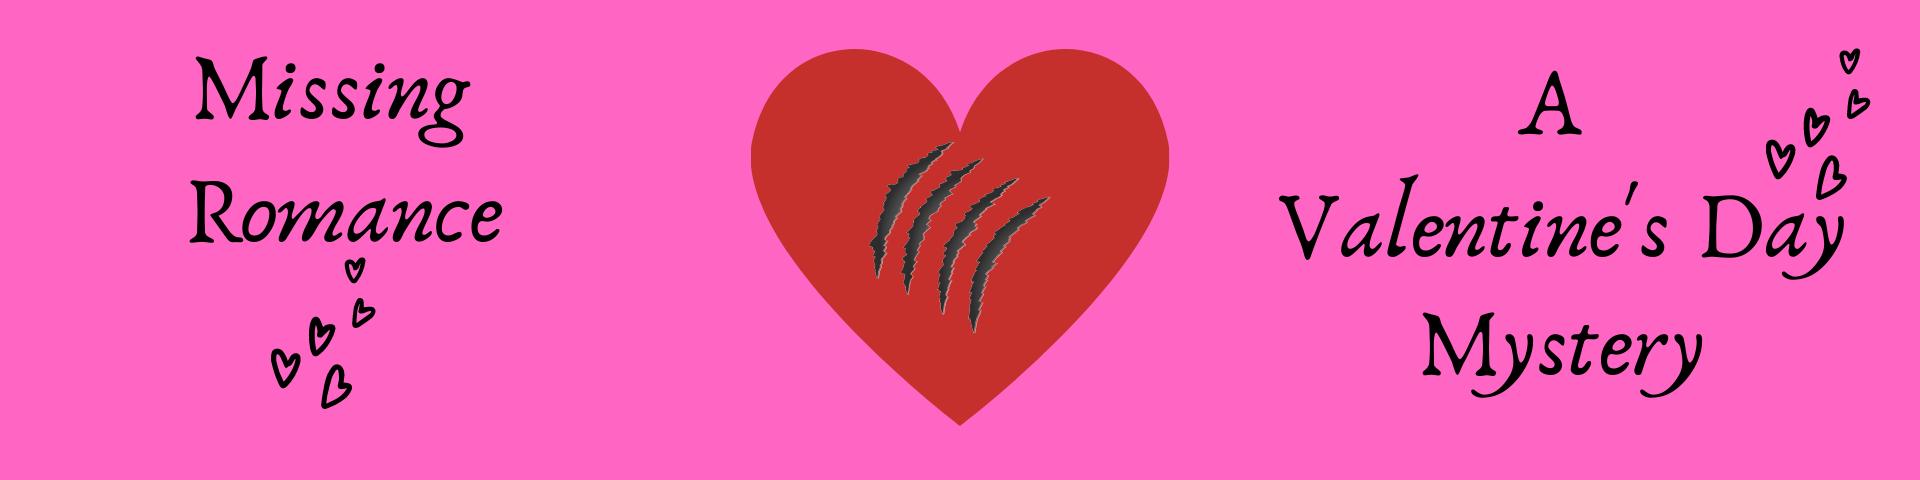 https://platform.breakoutedu.com/game/play/missing-romance-a-valentine-mystery-610915-EOC19LTZTM